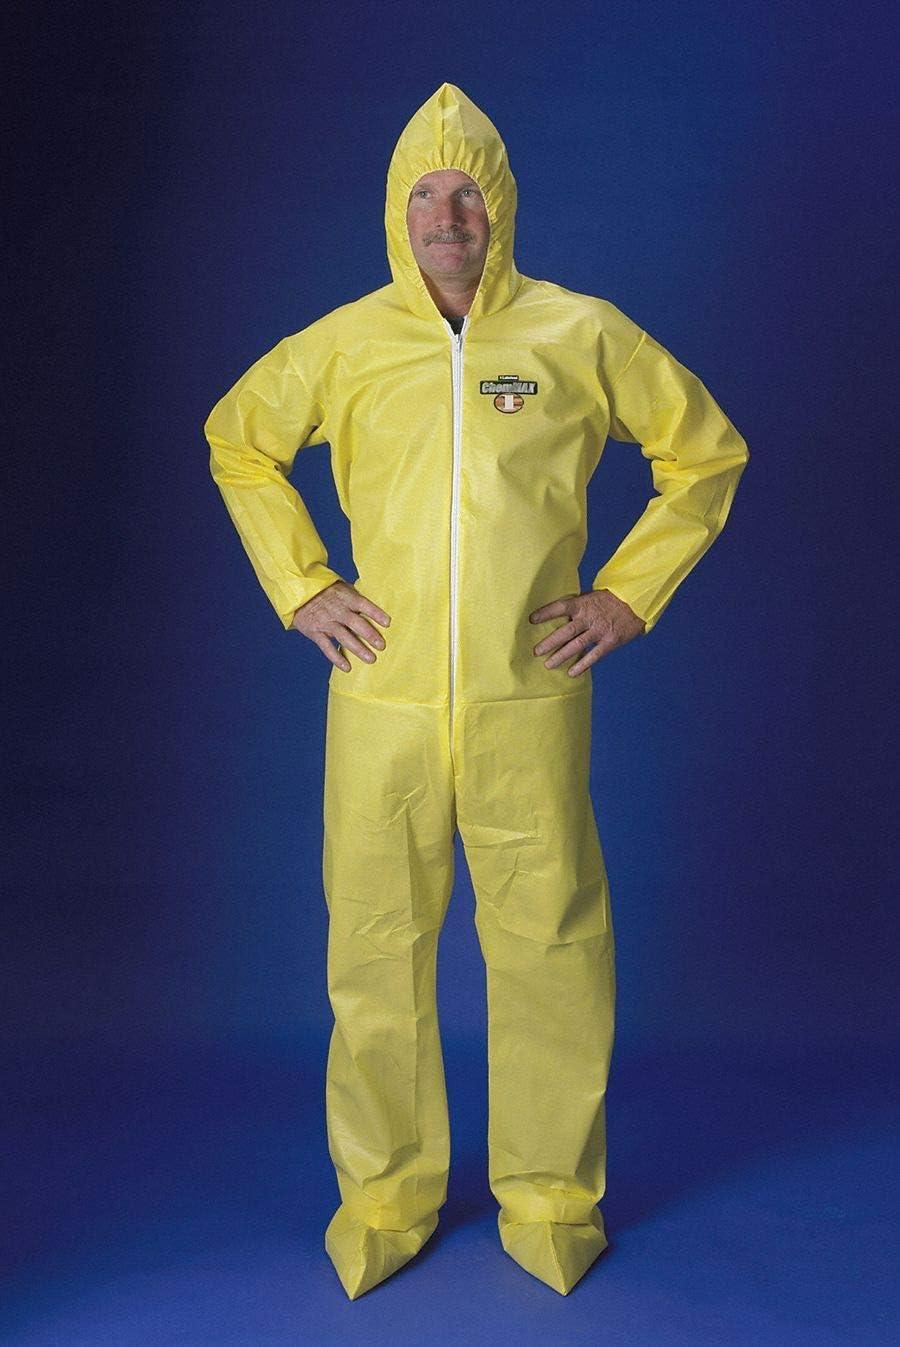 25 pcs of disposable ChemMax overalls XXXXL